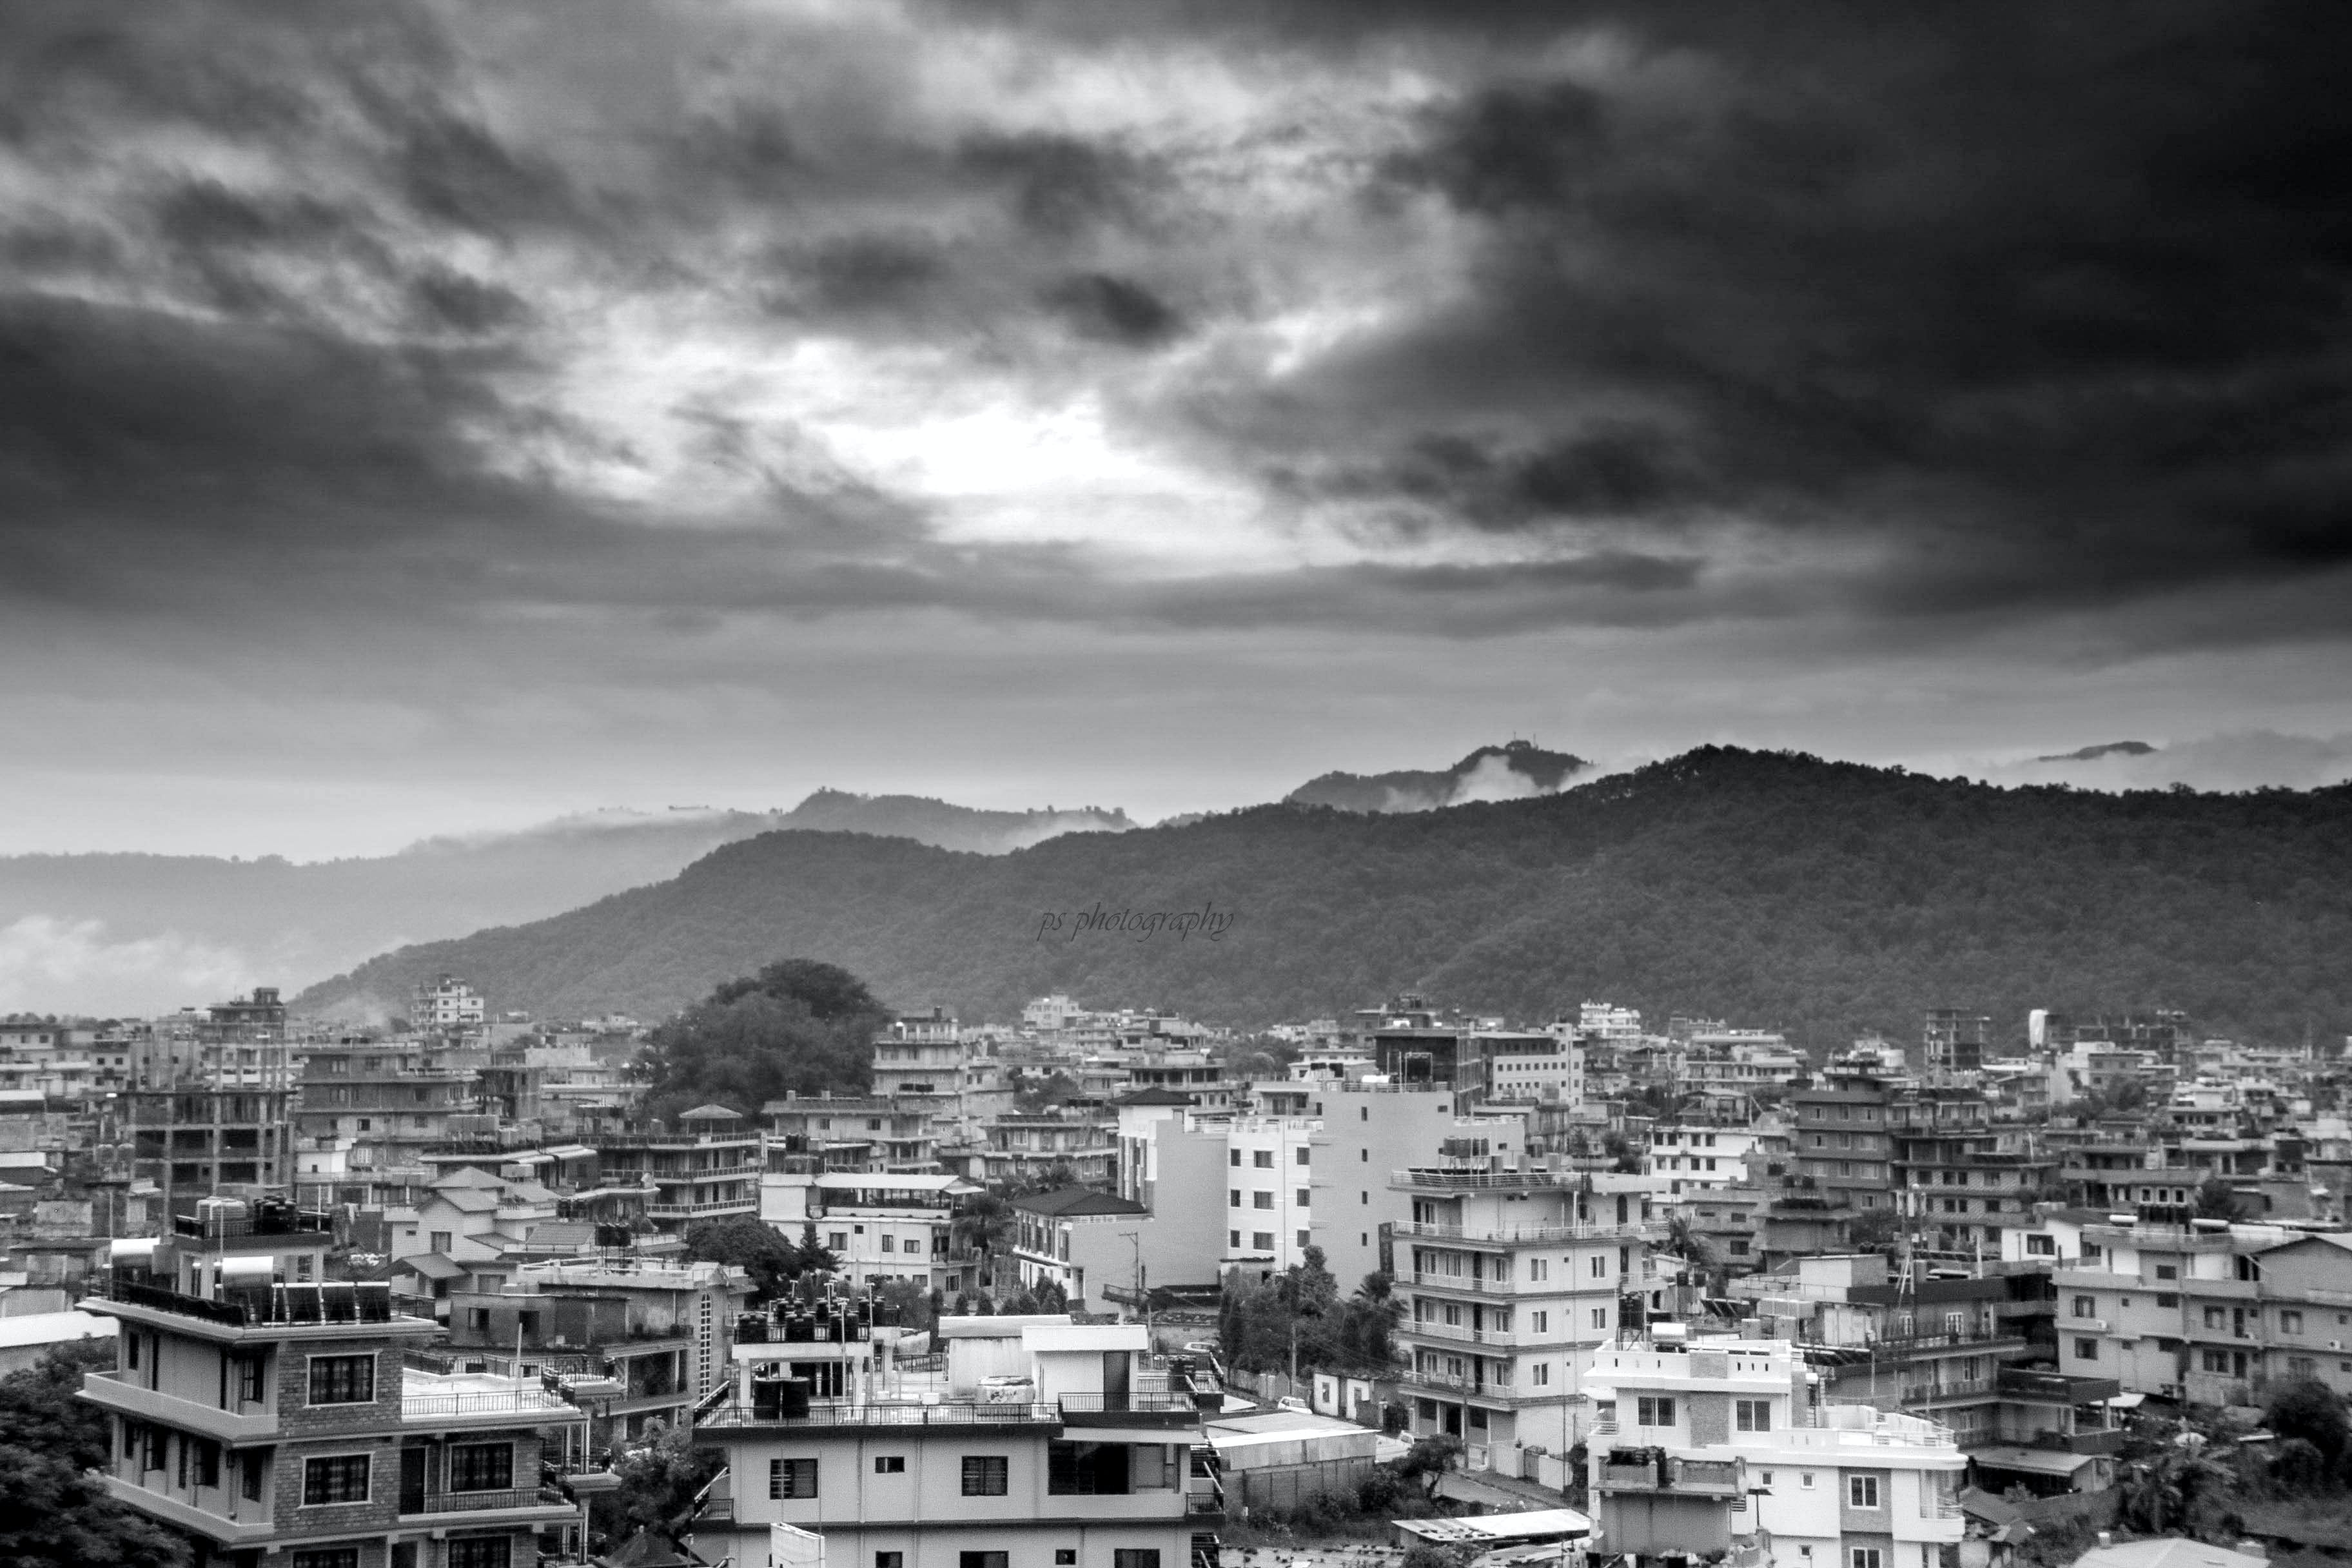 Free stock photo of pokhara city